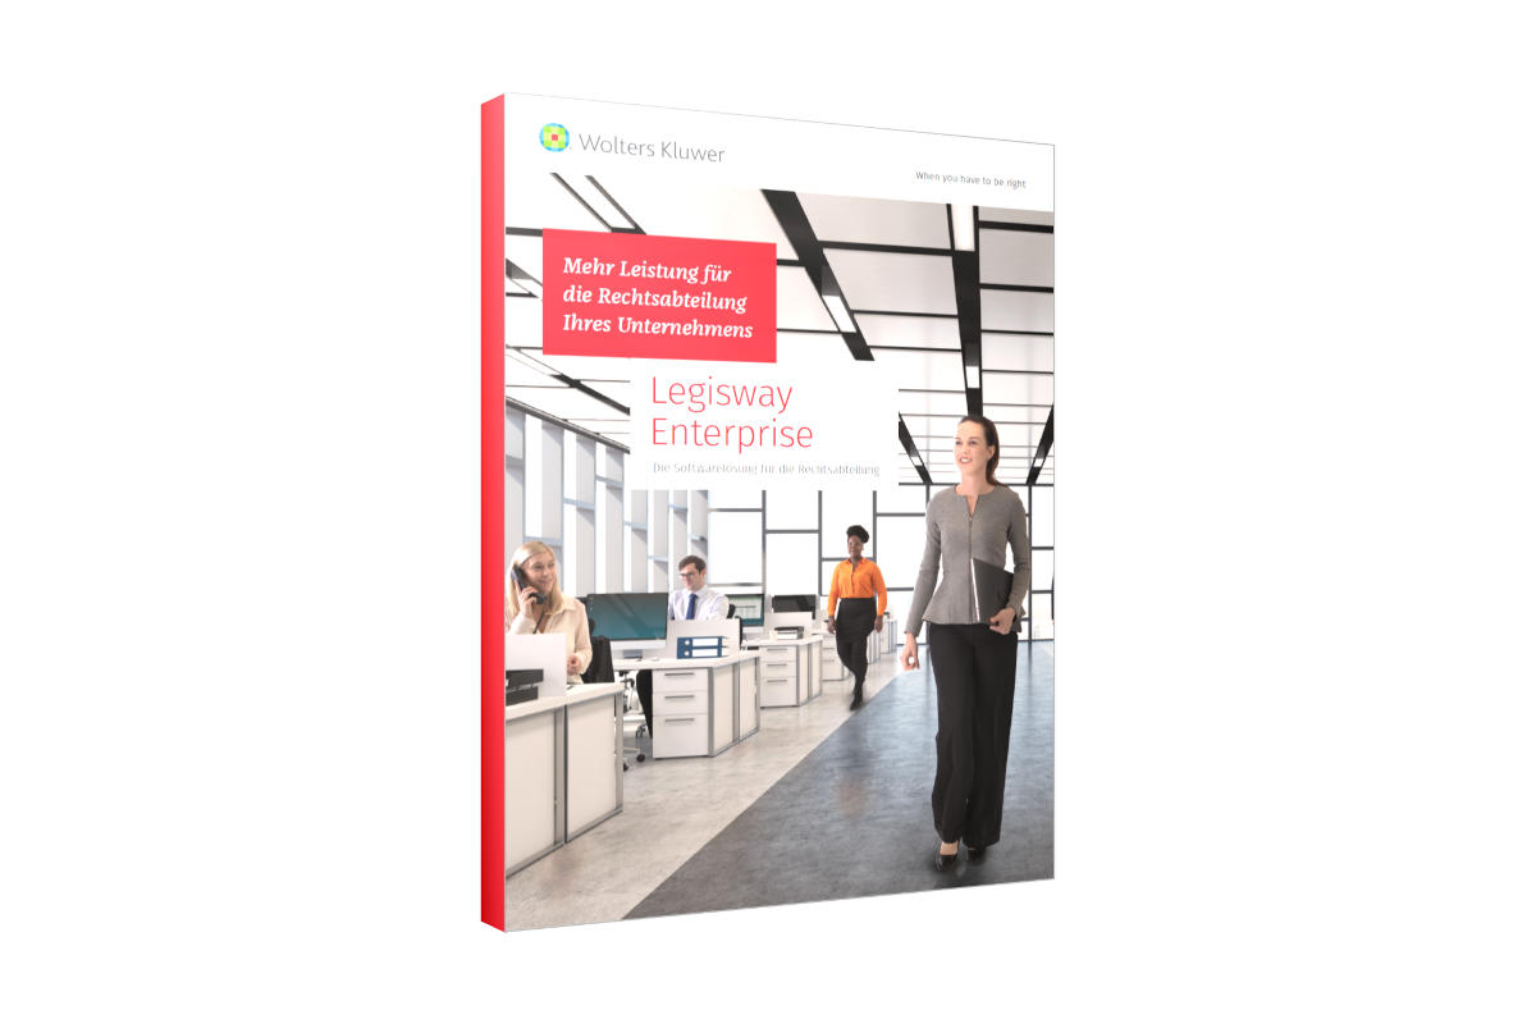 Legisway Enterprise Broschüre